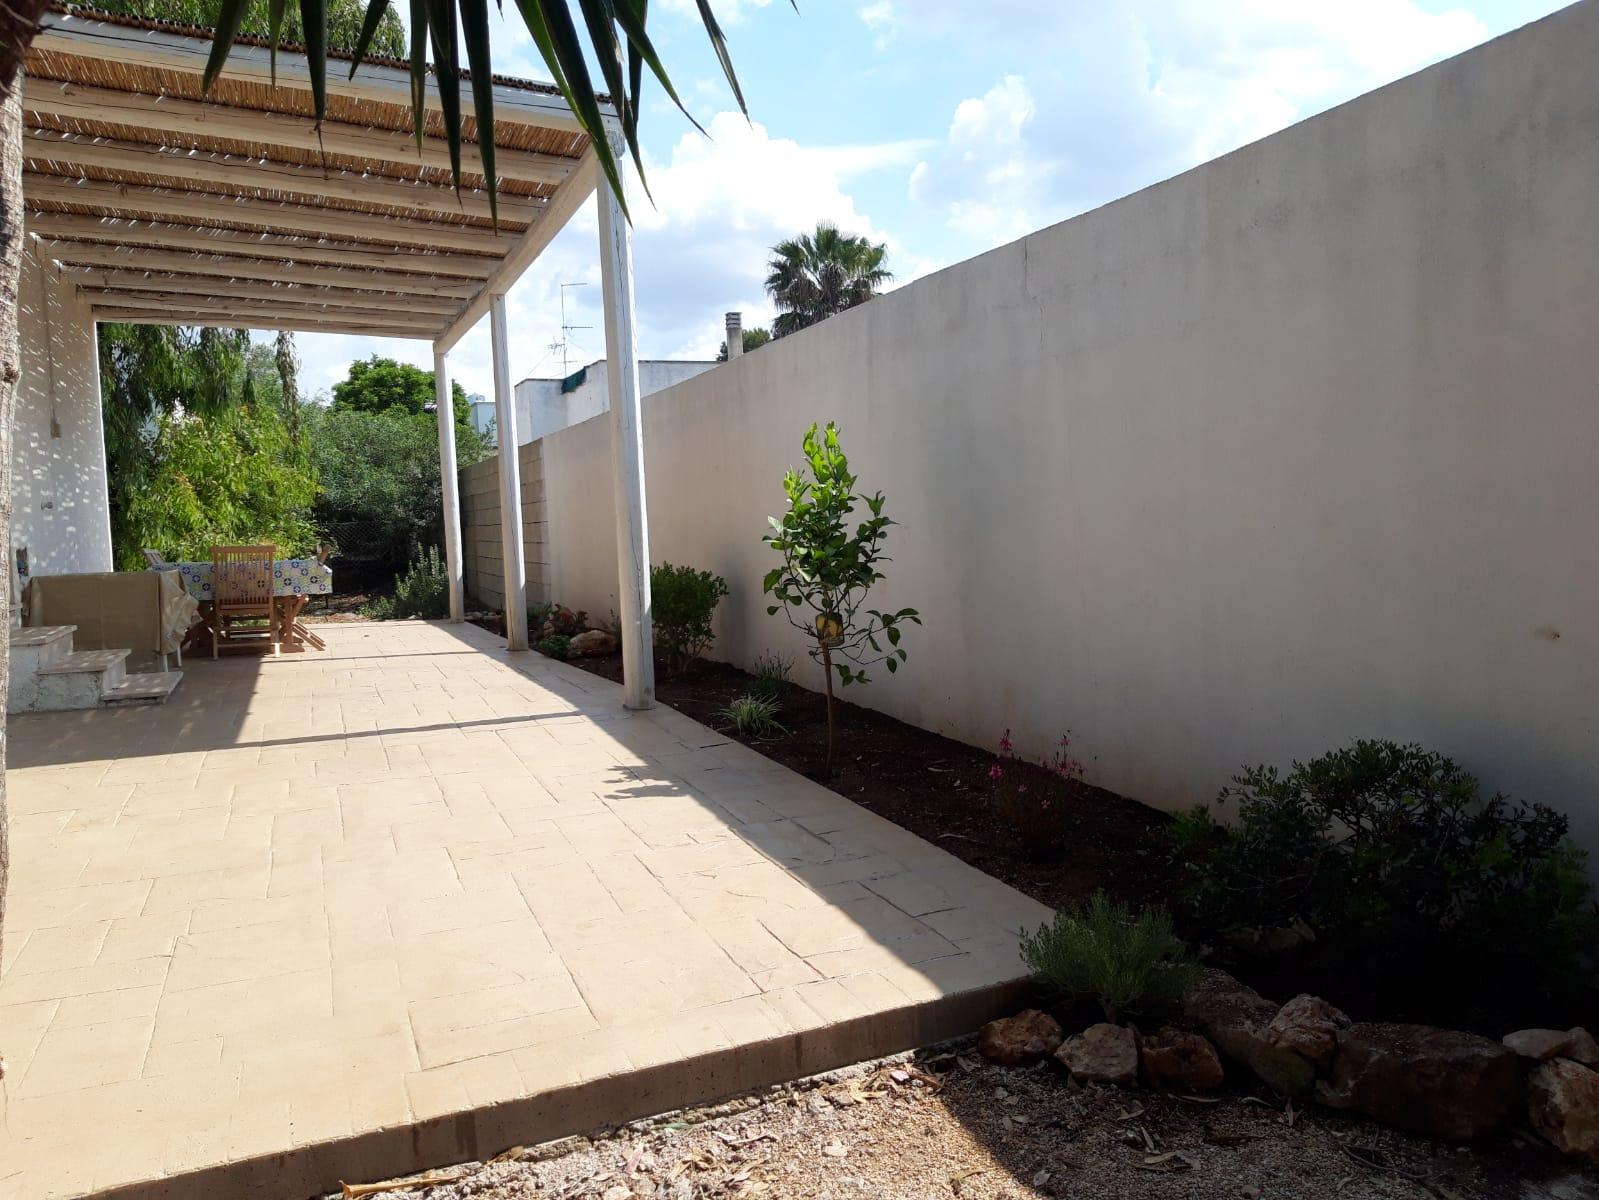 Ferienhaus Villa Mariposa n°3, only 200 meters from the beach (2354067), Porto Cesareo, Lecce, Apulien, Italien, Bild 23